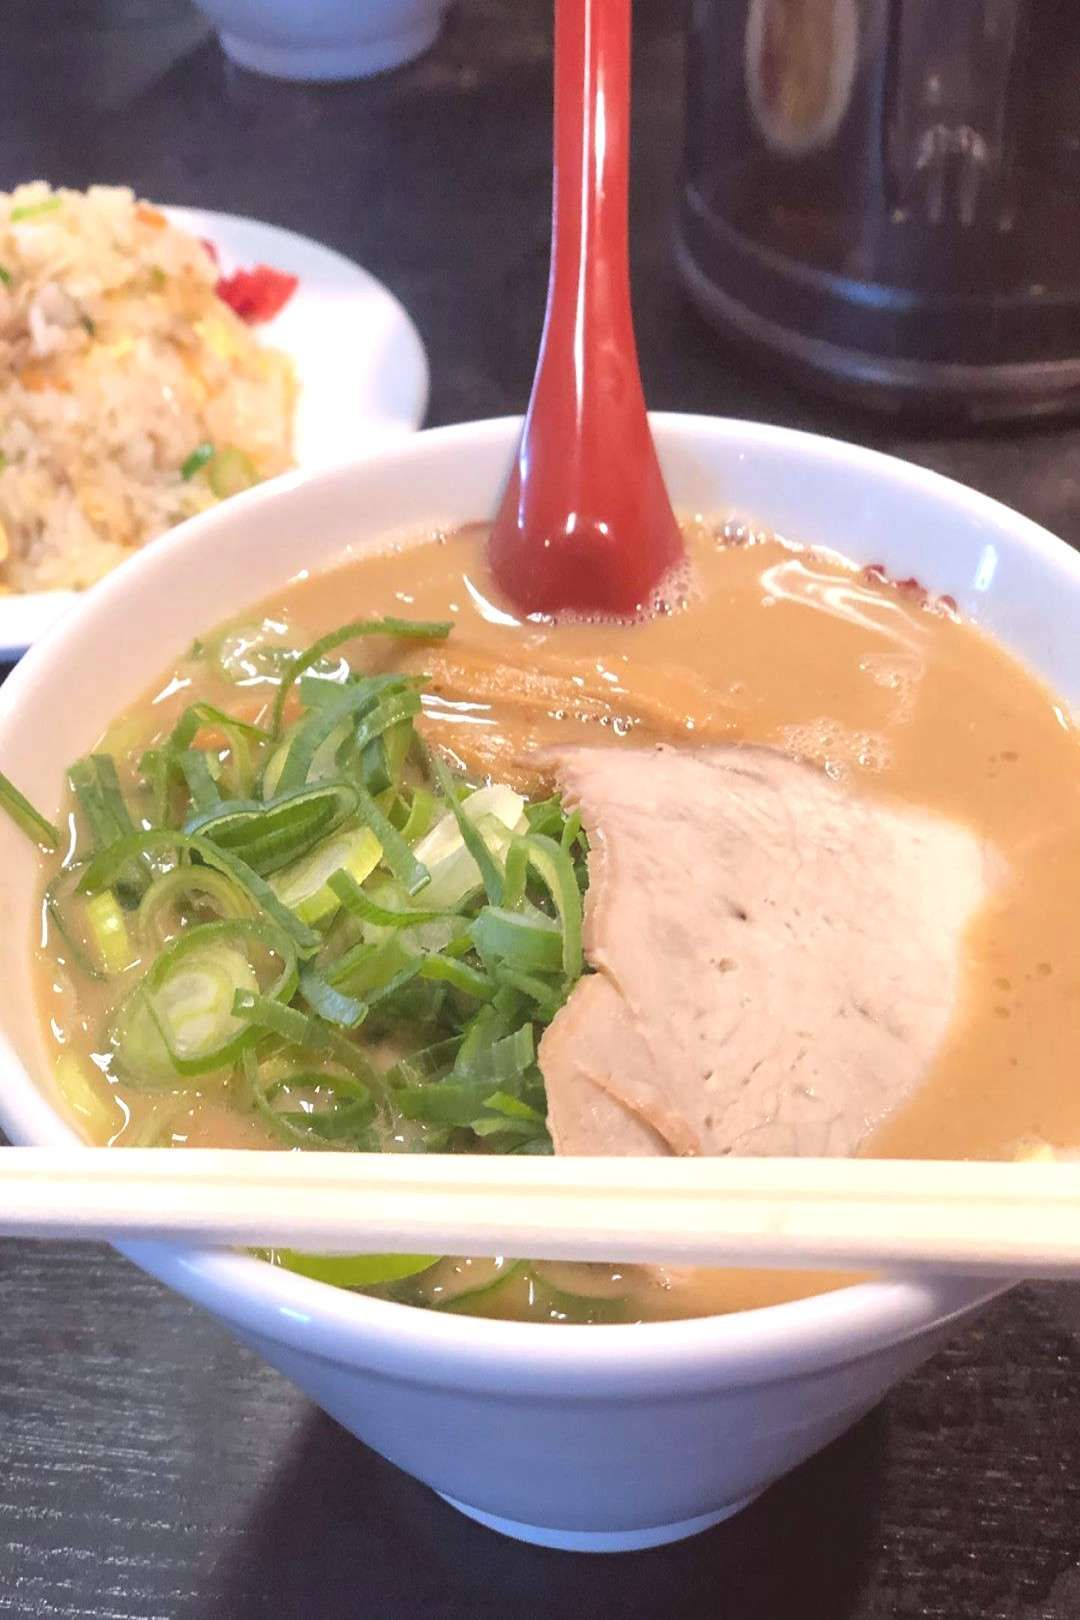 #comidajaponesa #fukuoka #comemos #almoco #ramen #esse #food #no #a #t Comemos esse ramen no almoco a Fukuoka. #ramen #comidajaponesa #tYou can find Ramen and more on our website.Comemos esse ramen no almoco a Fukuoka. #ramen #comidajaponesa #t